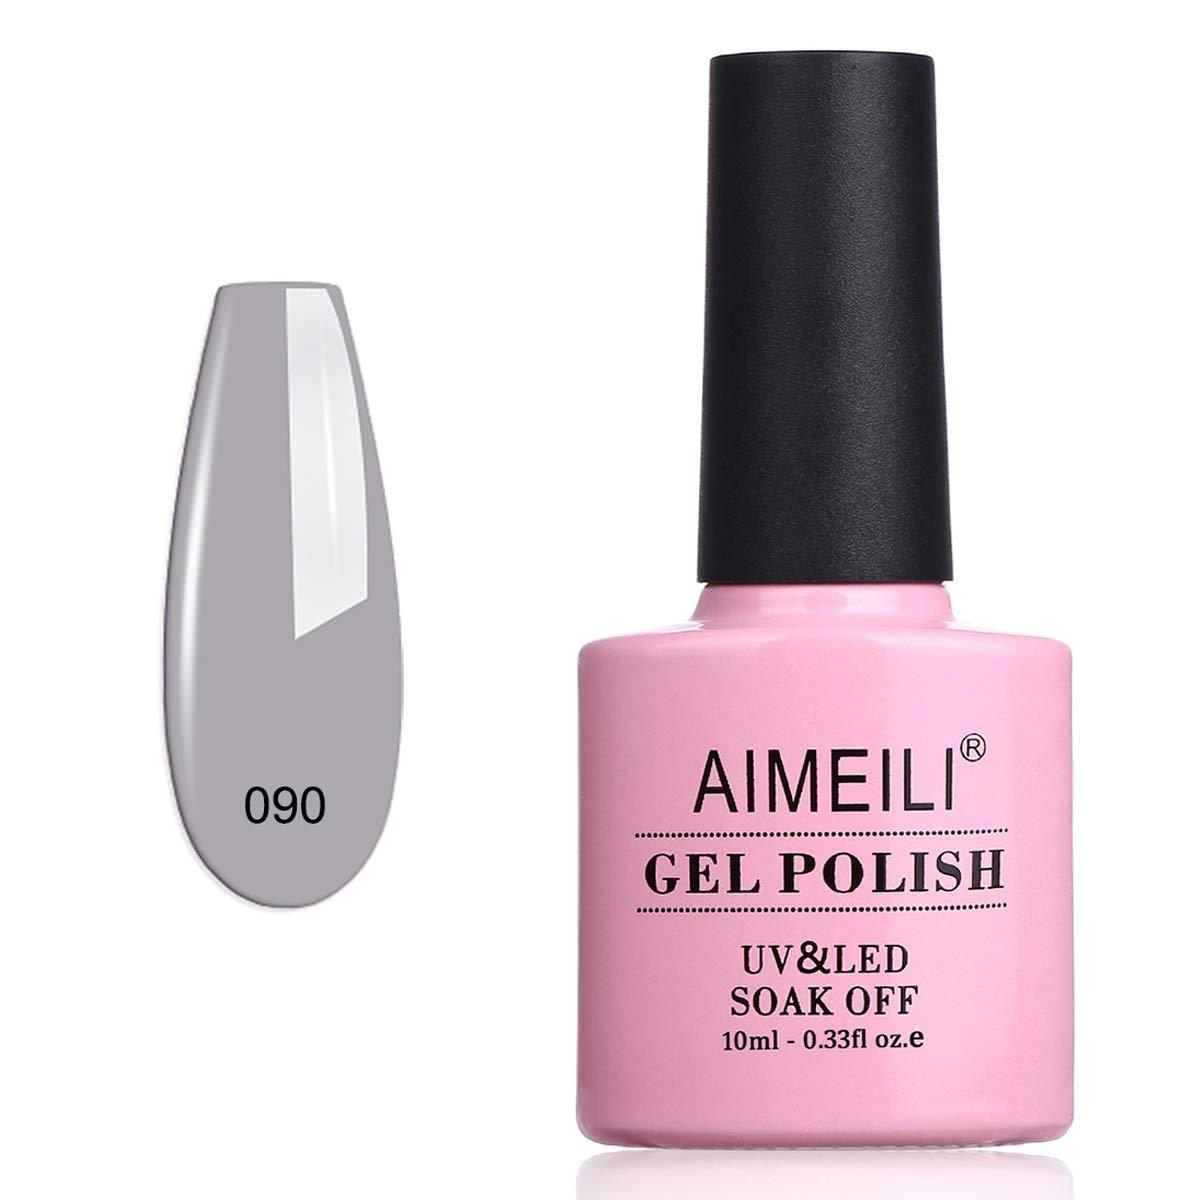 AIMEILI Soak Off UV LED Gel Nail Polish - Dare To Show (090) 10ml